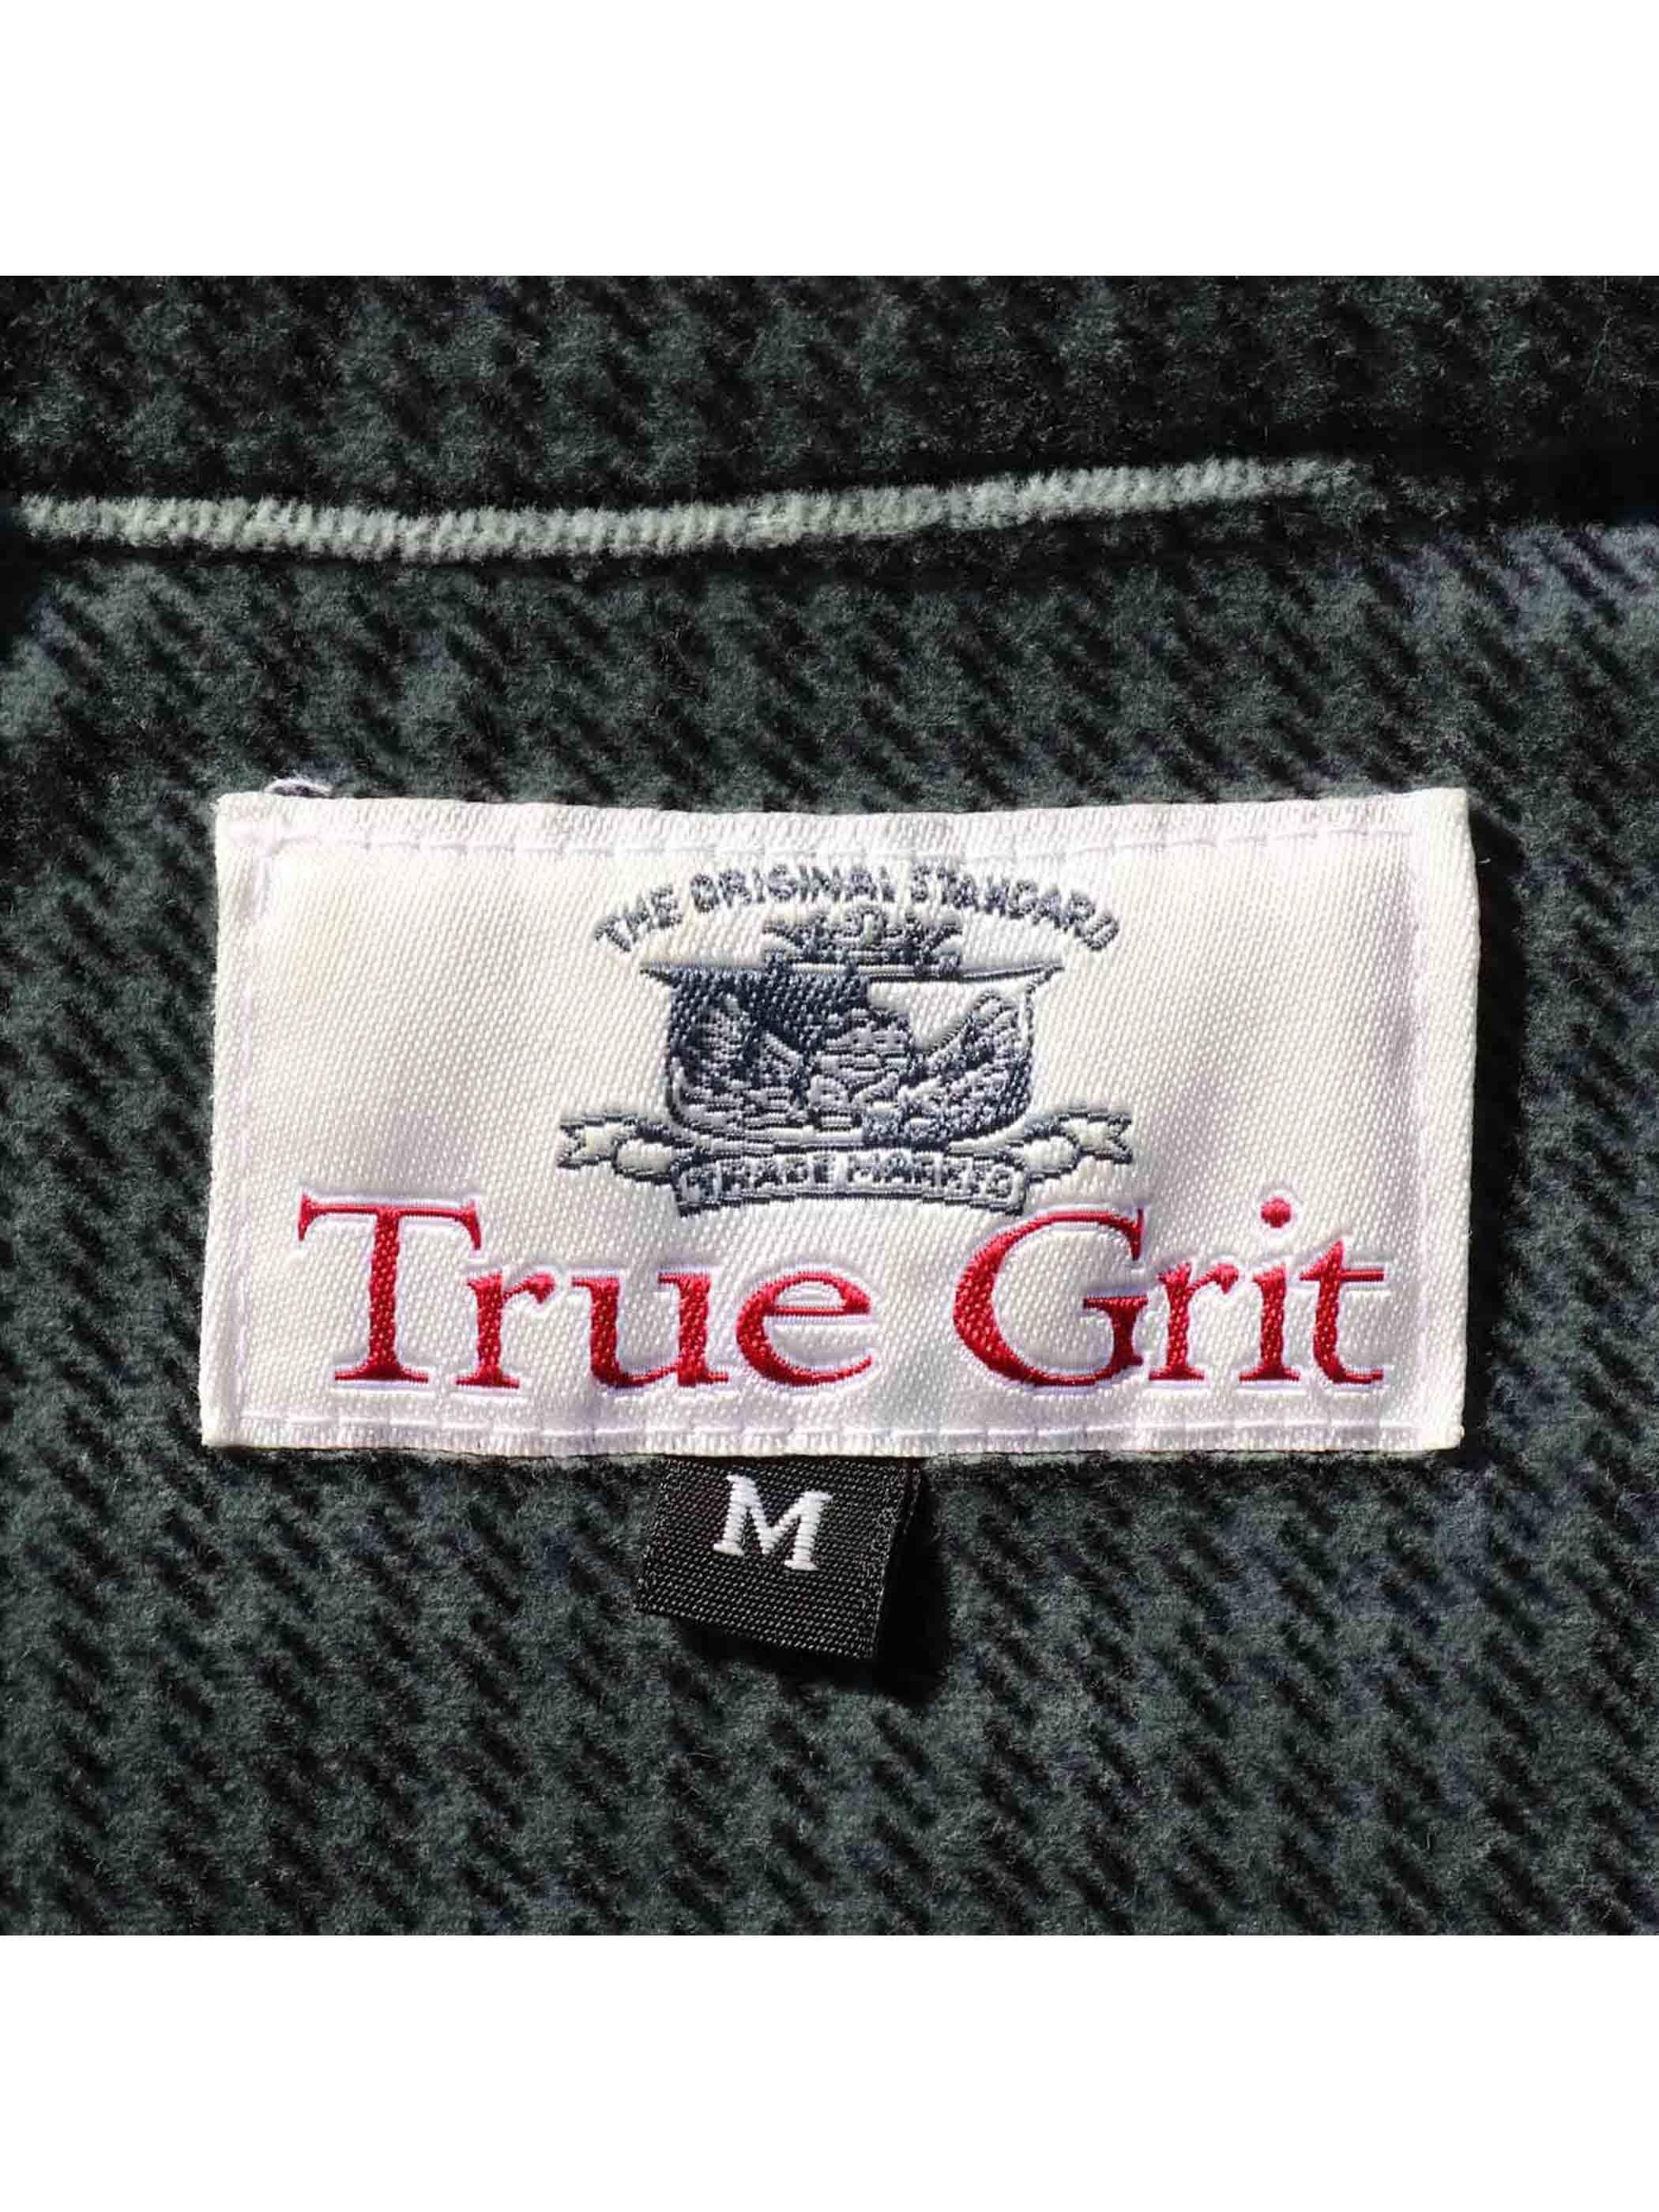 90's TRUE GIFT USA製 ハウンドトゥース ベルベットシャツ [M]